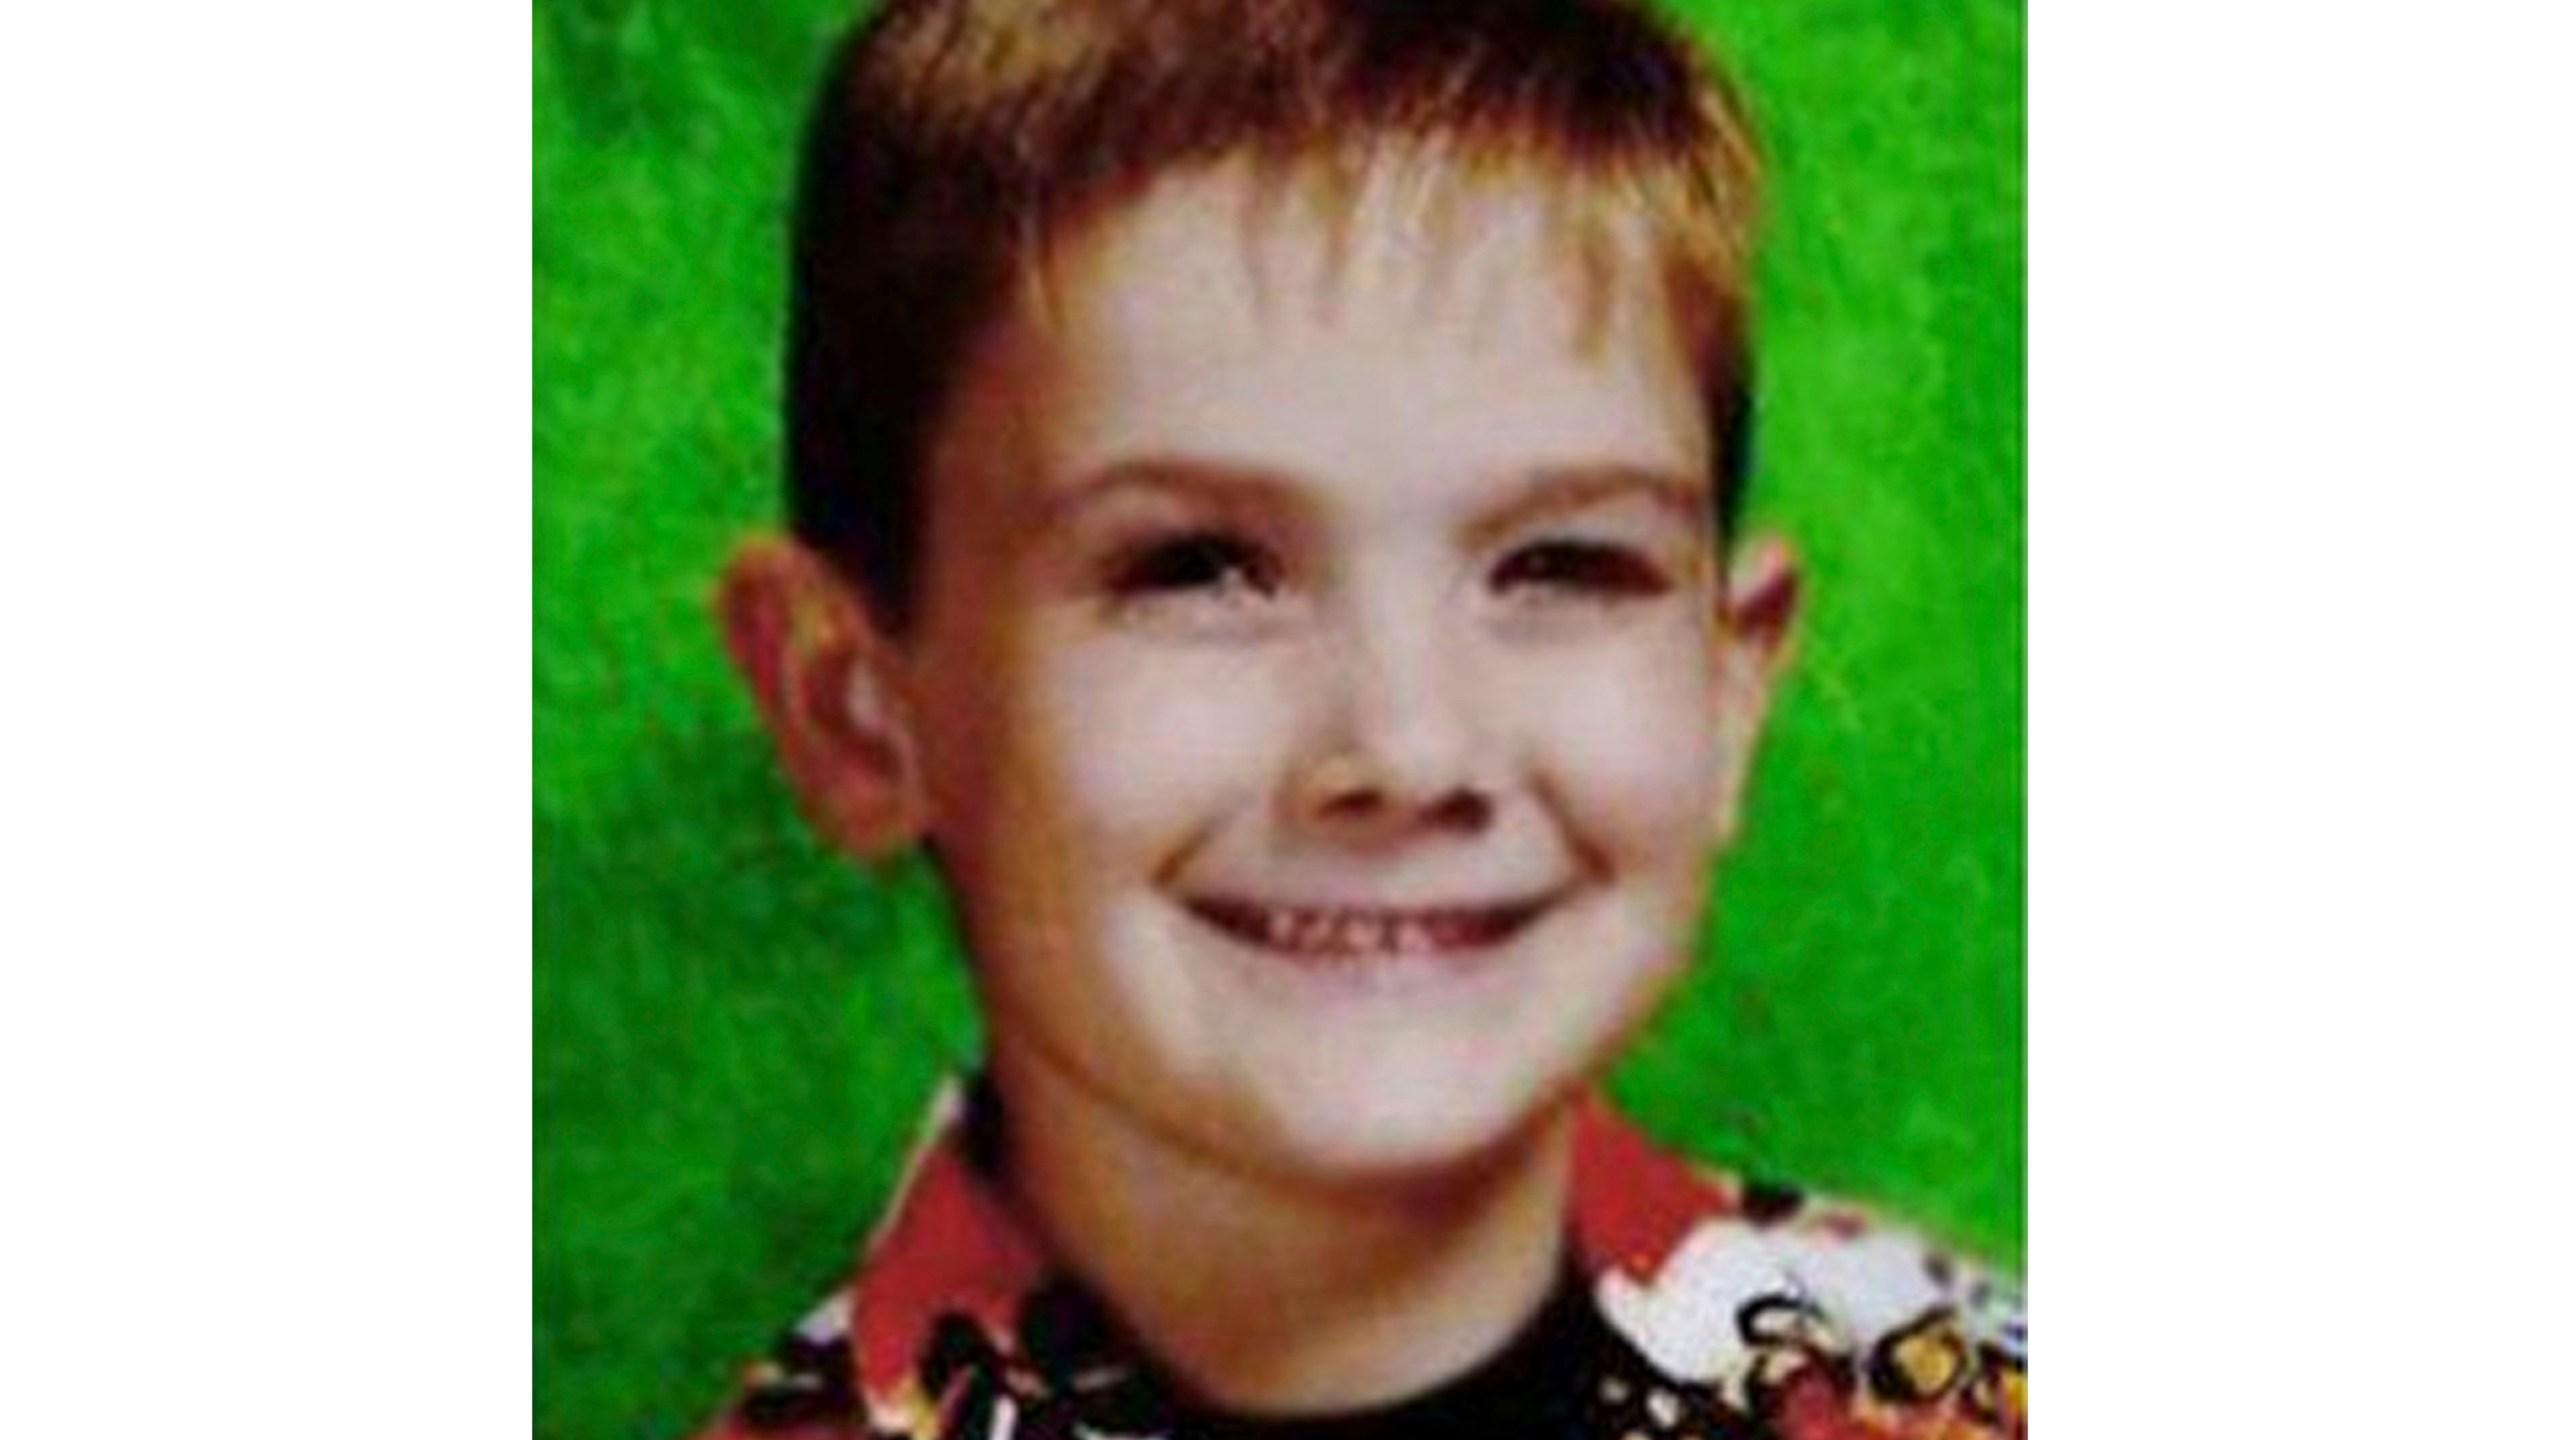 Missing Child Investigation_1554411525049